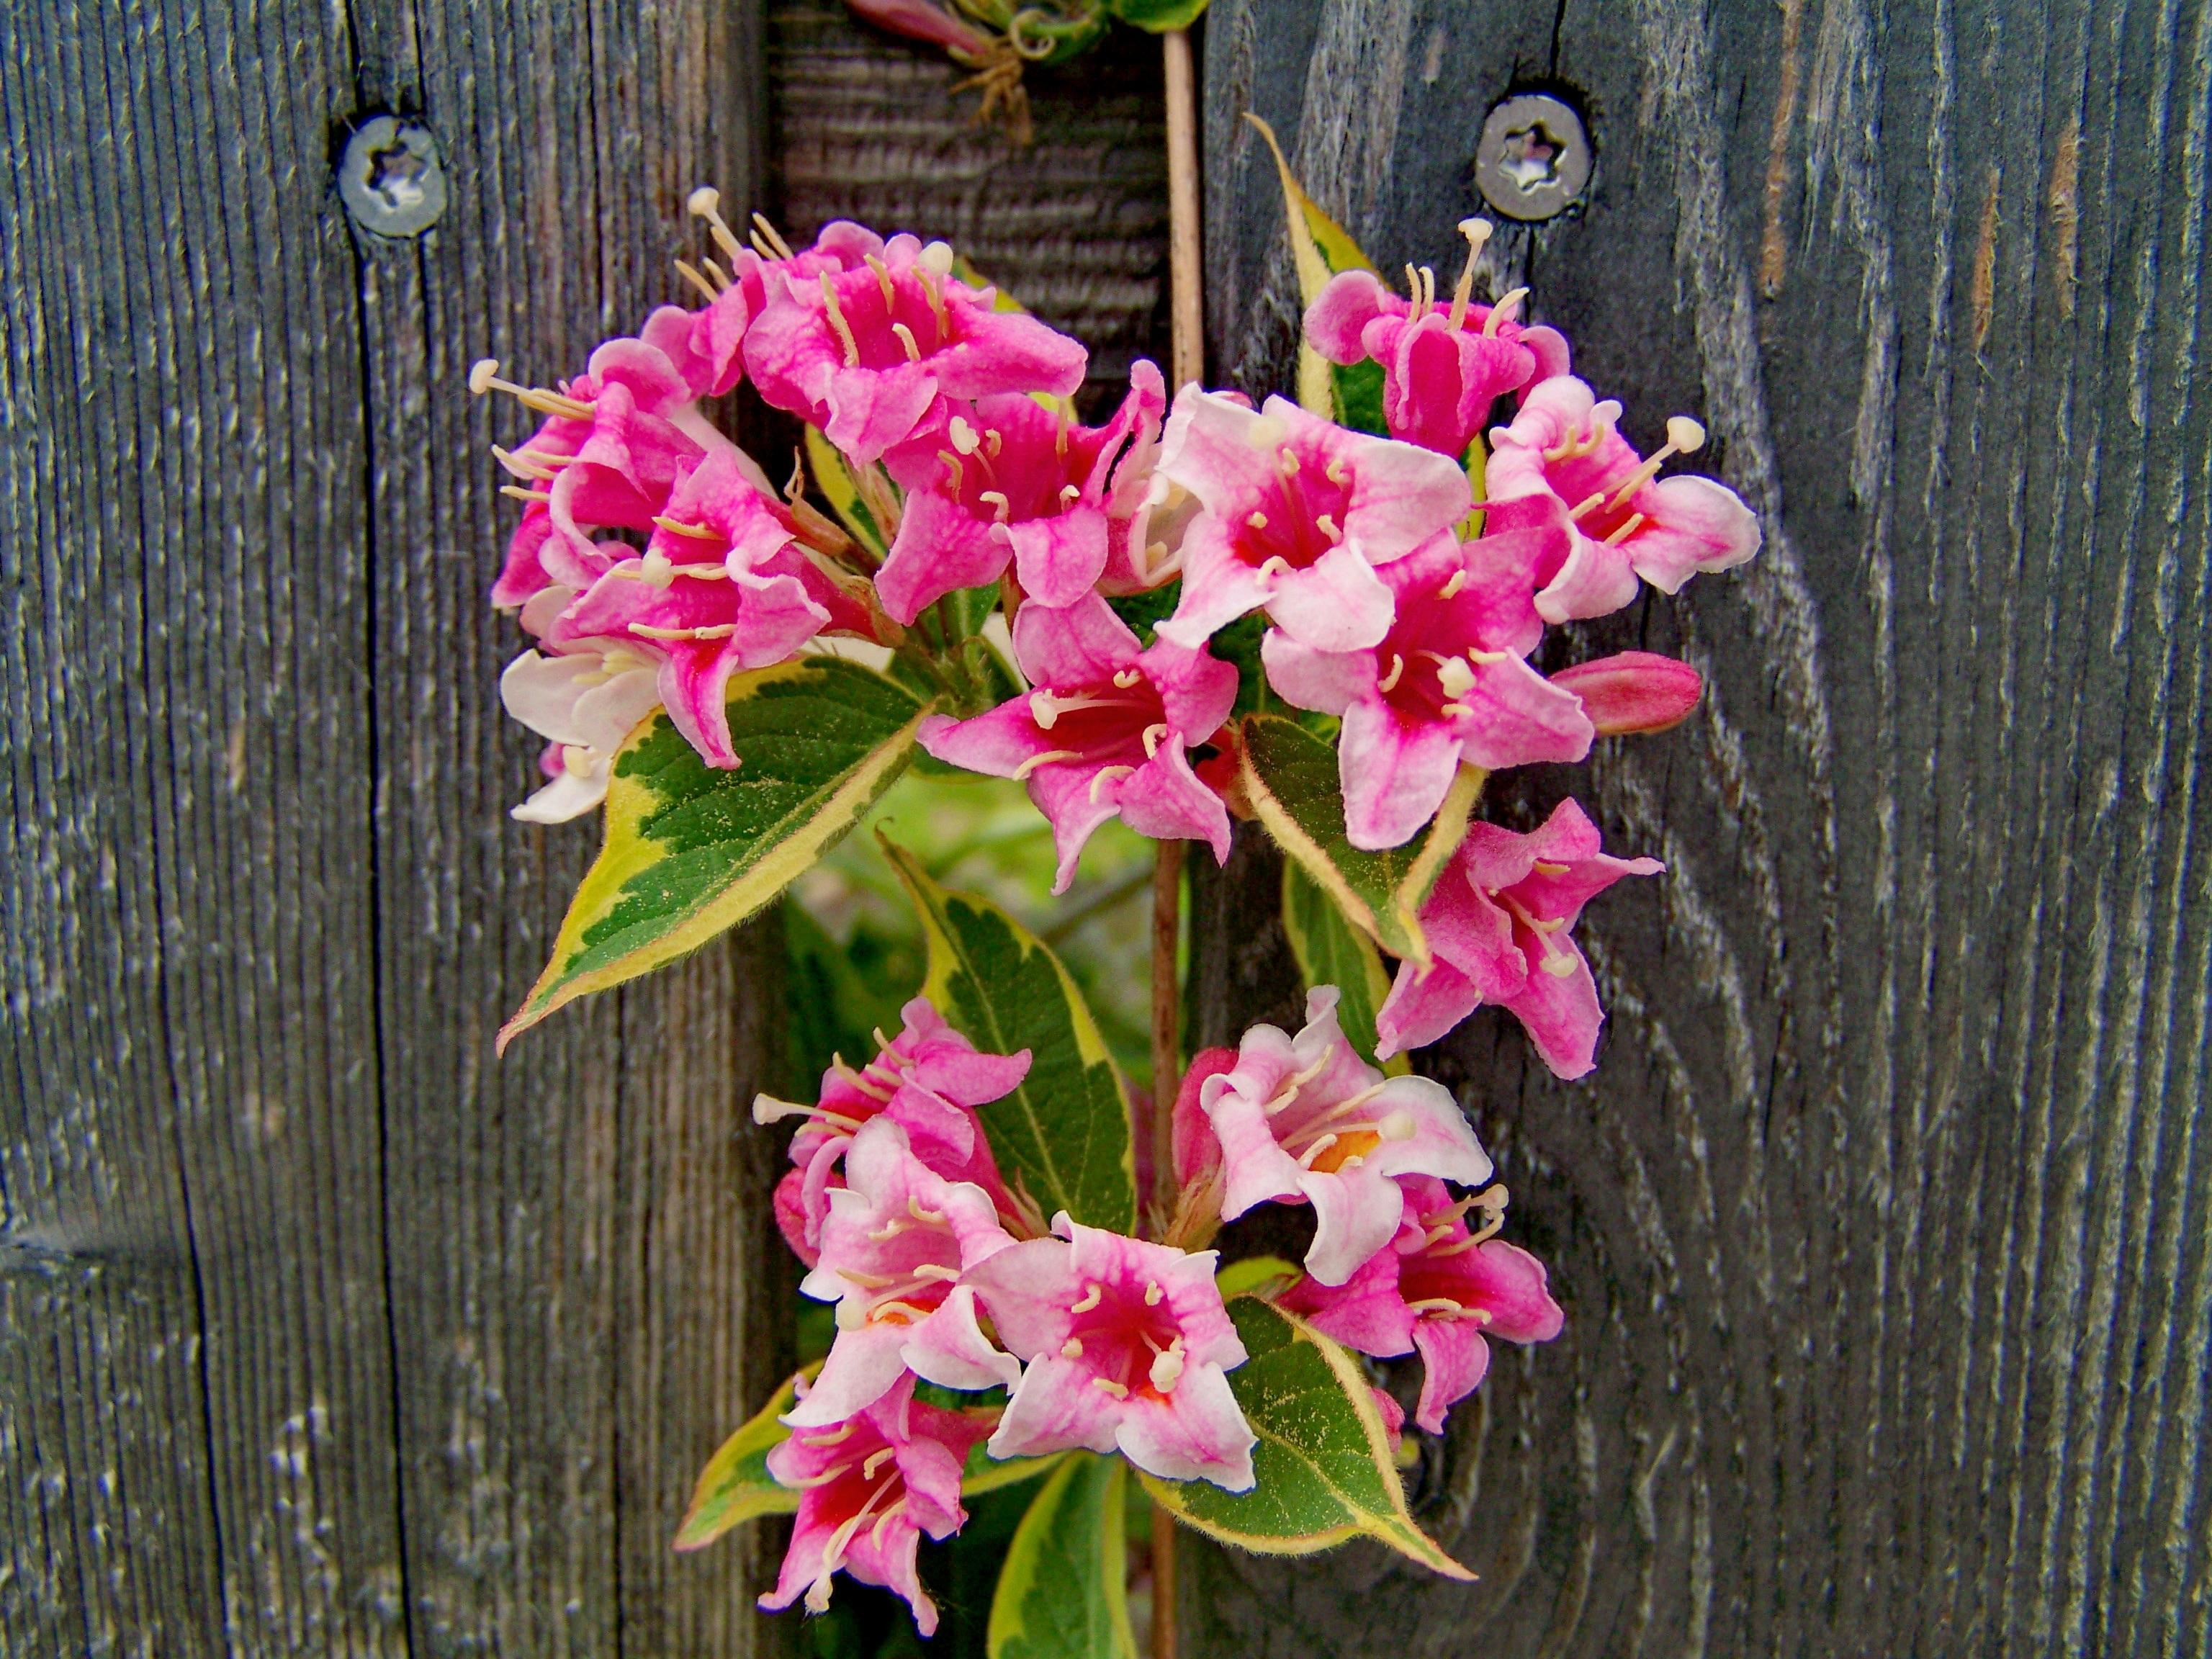 Free Images Blossom Flower Botany Garden Flora Orchid